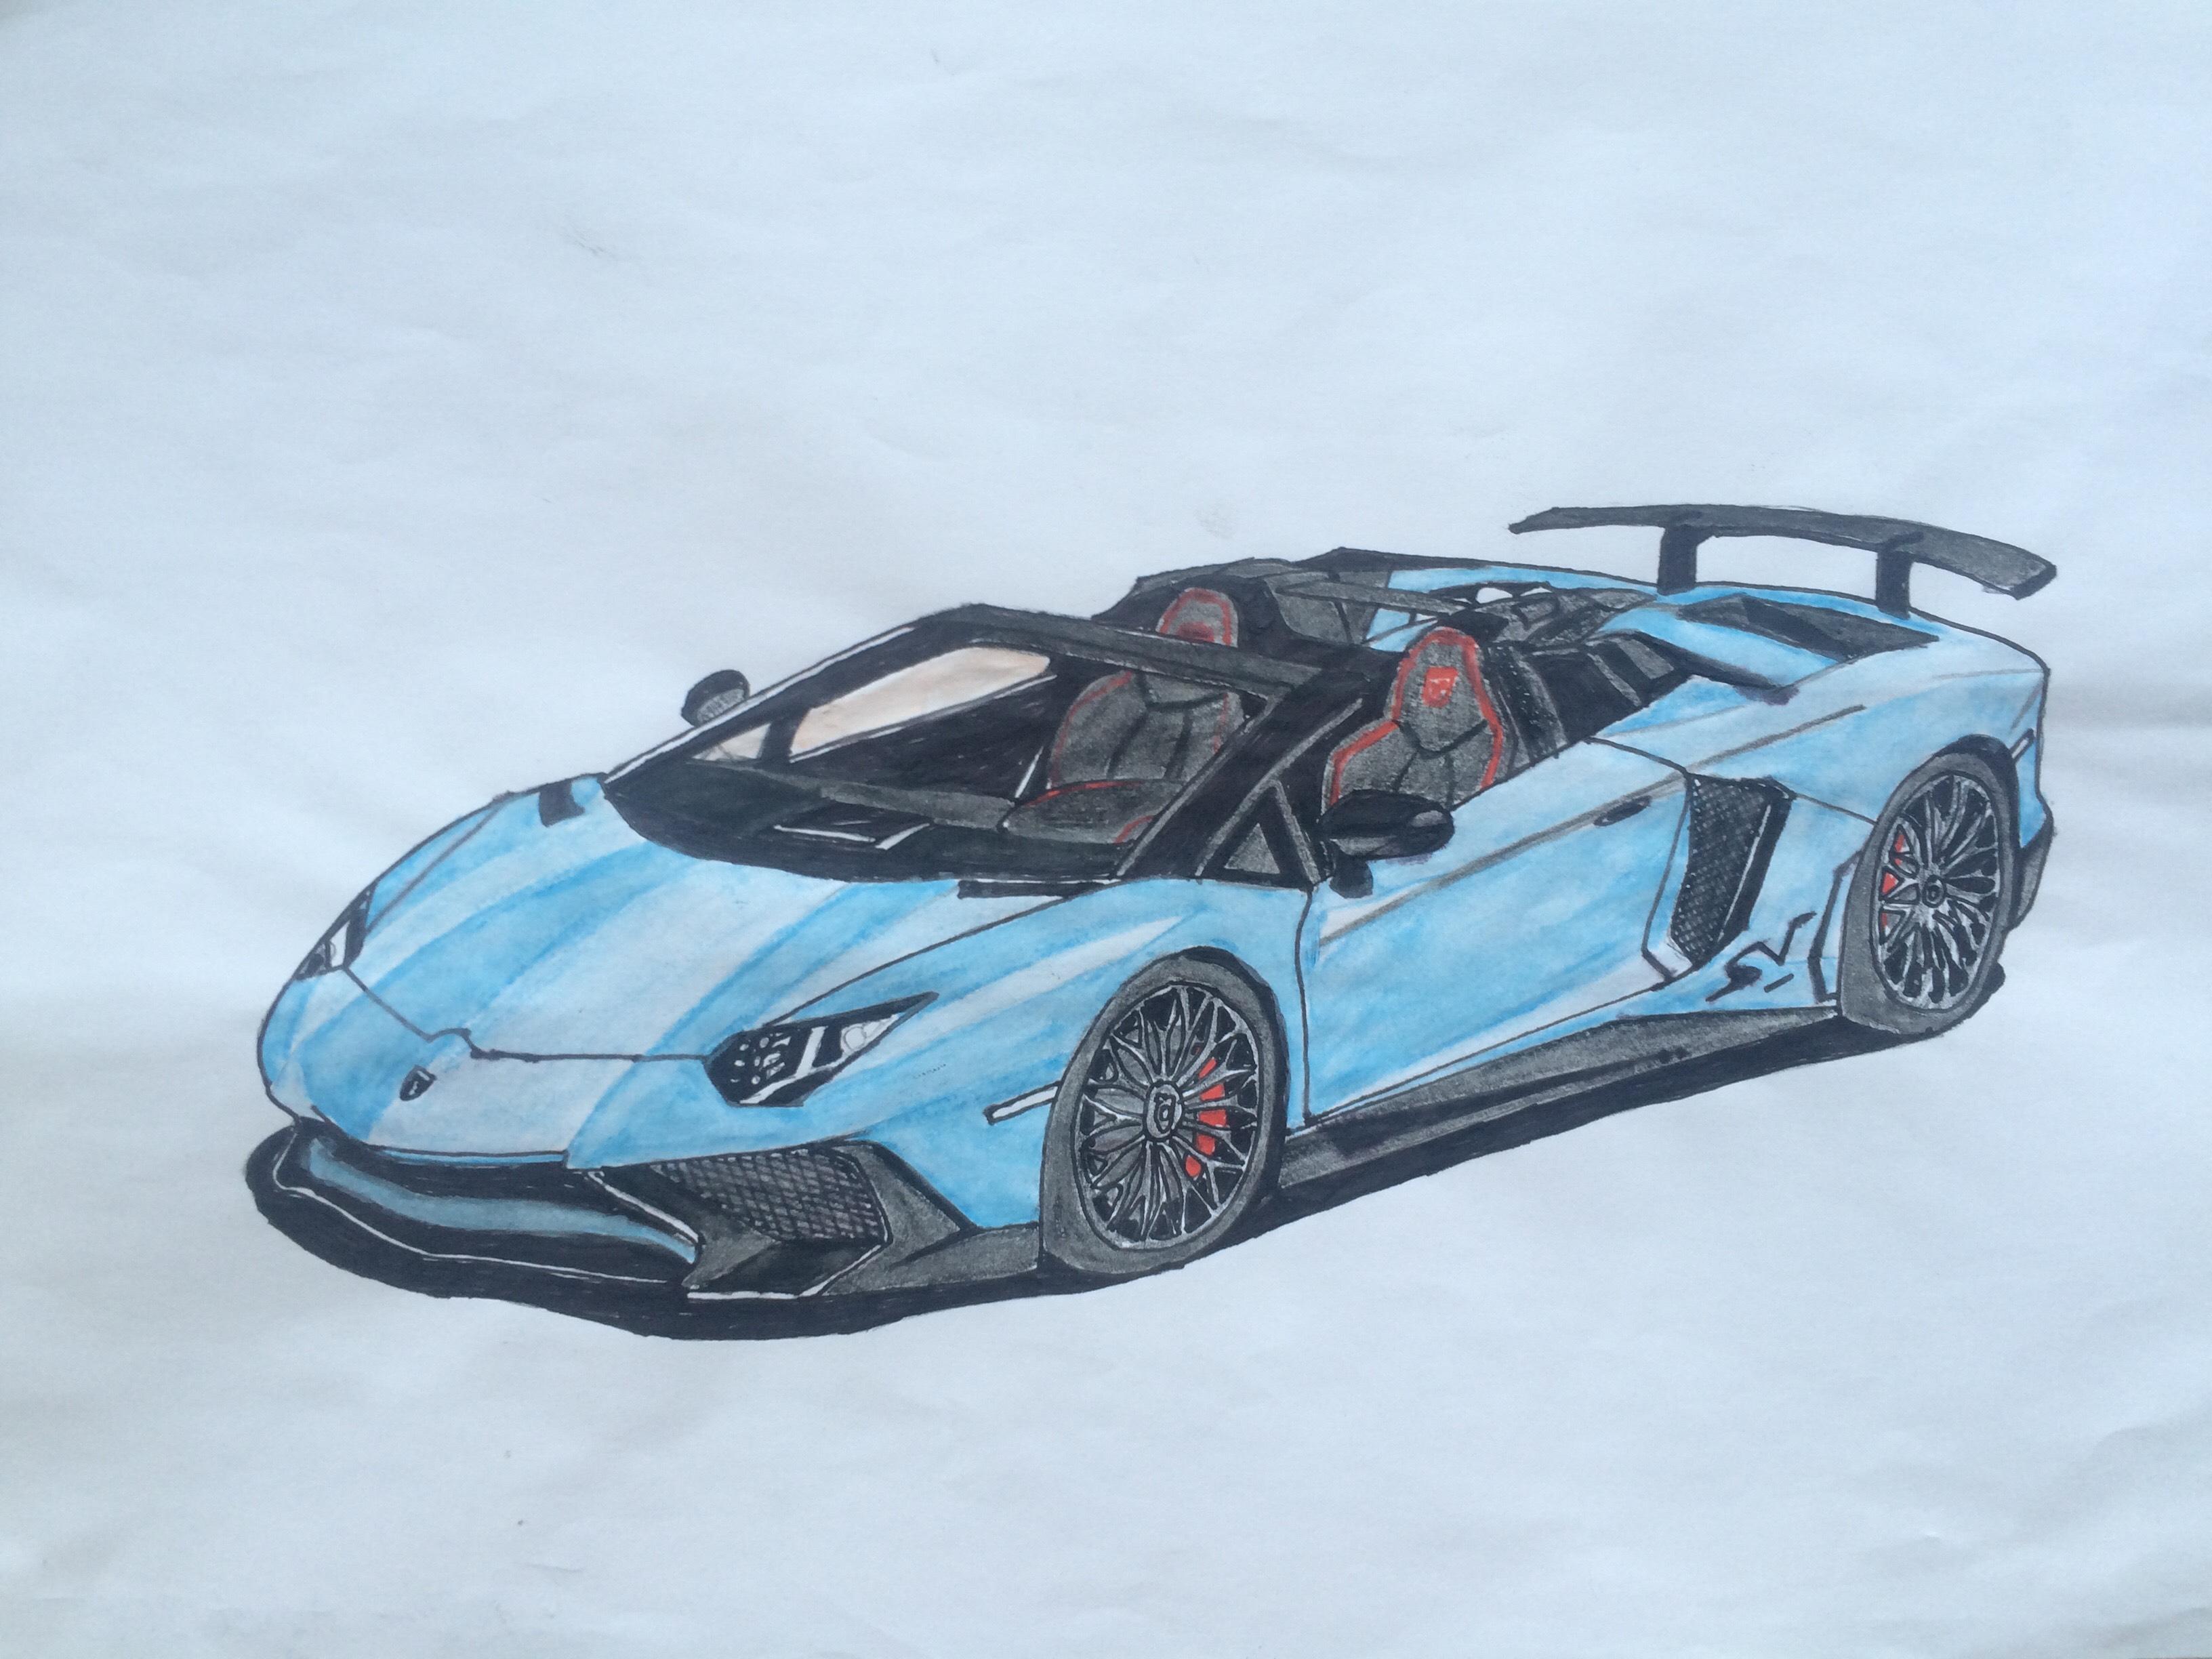 Drawn amd lamborghini aventador Of Roadster Lamborghini of the